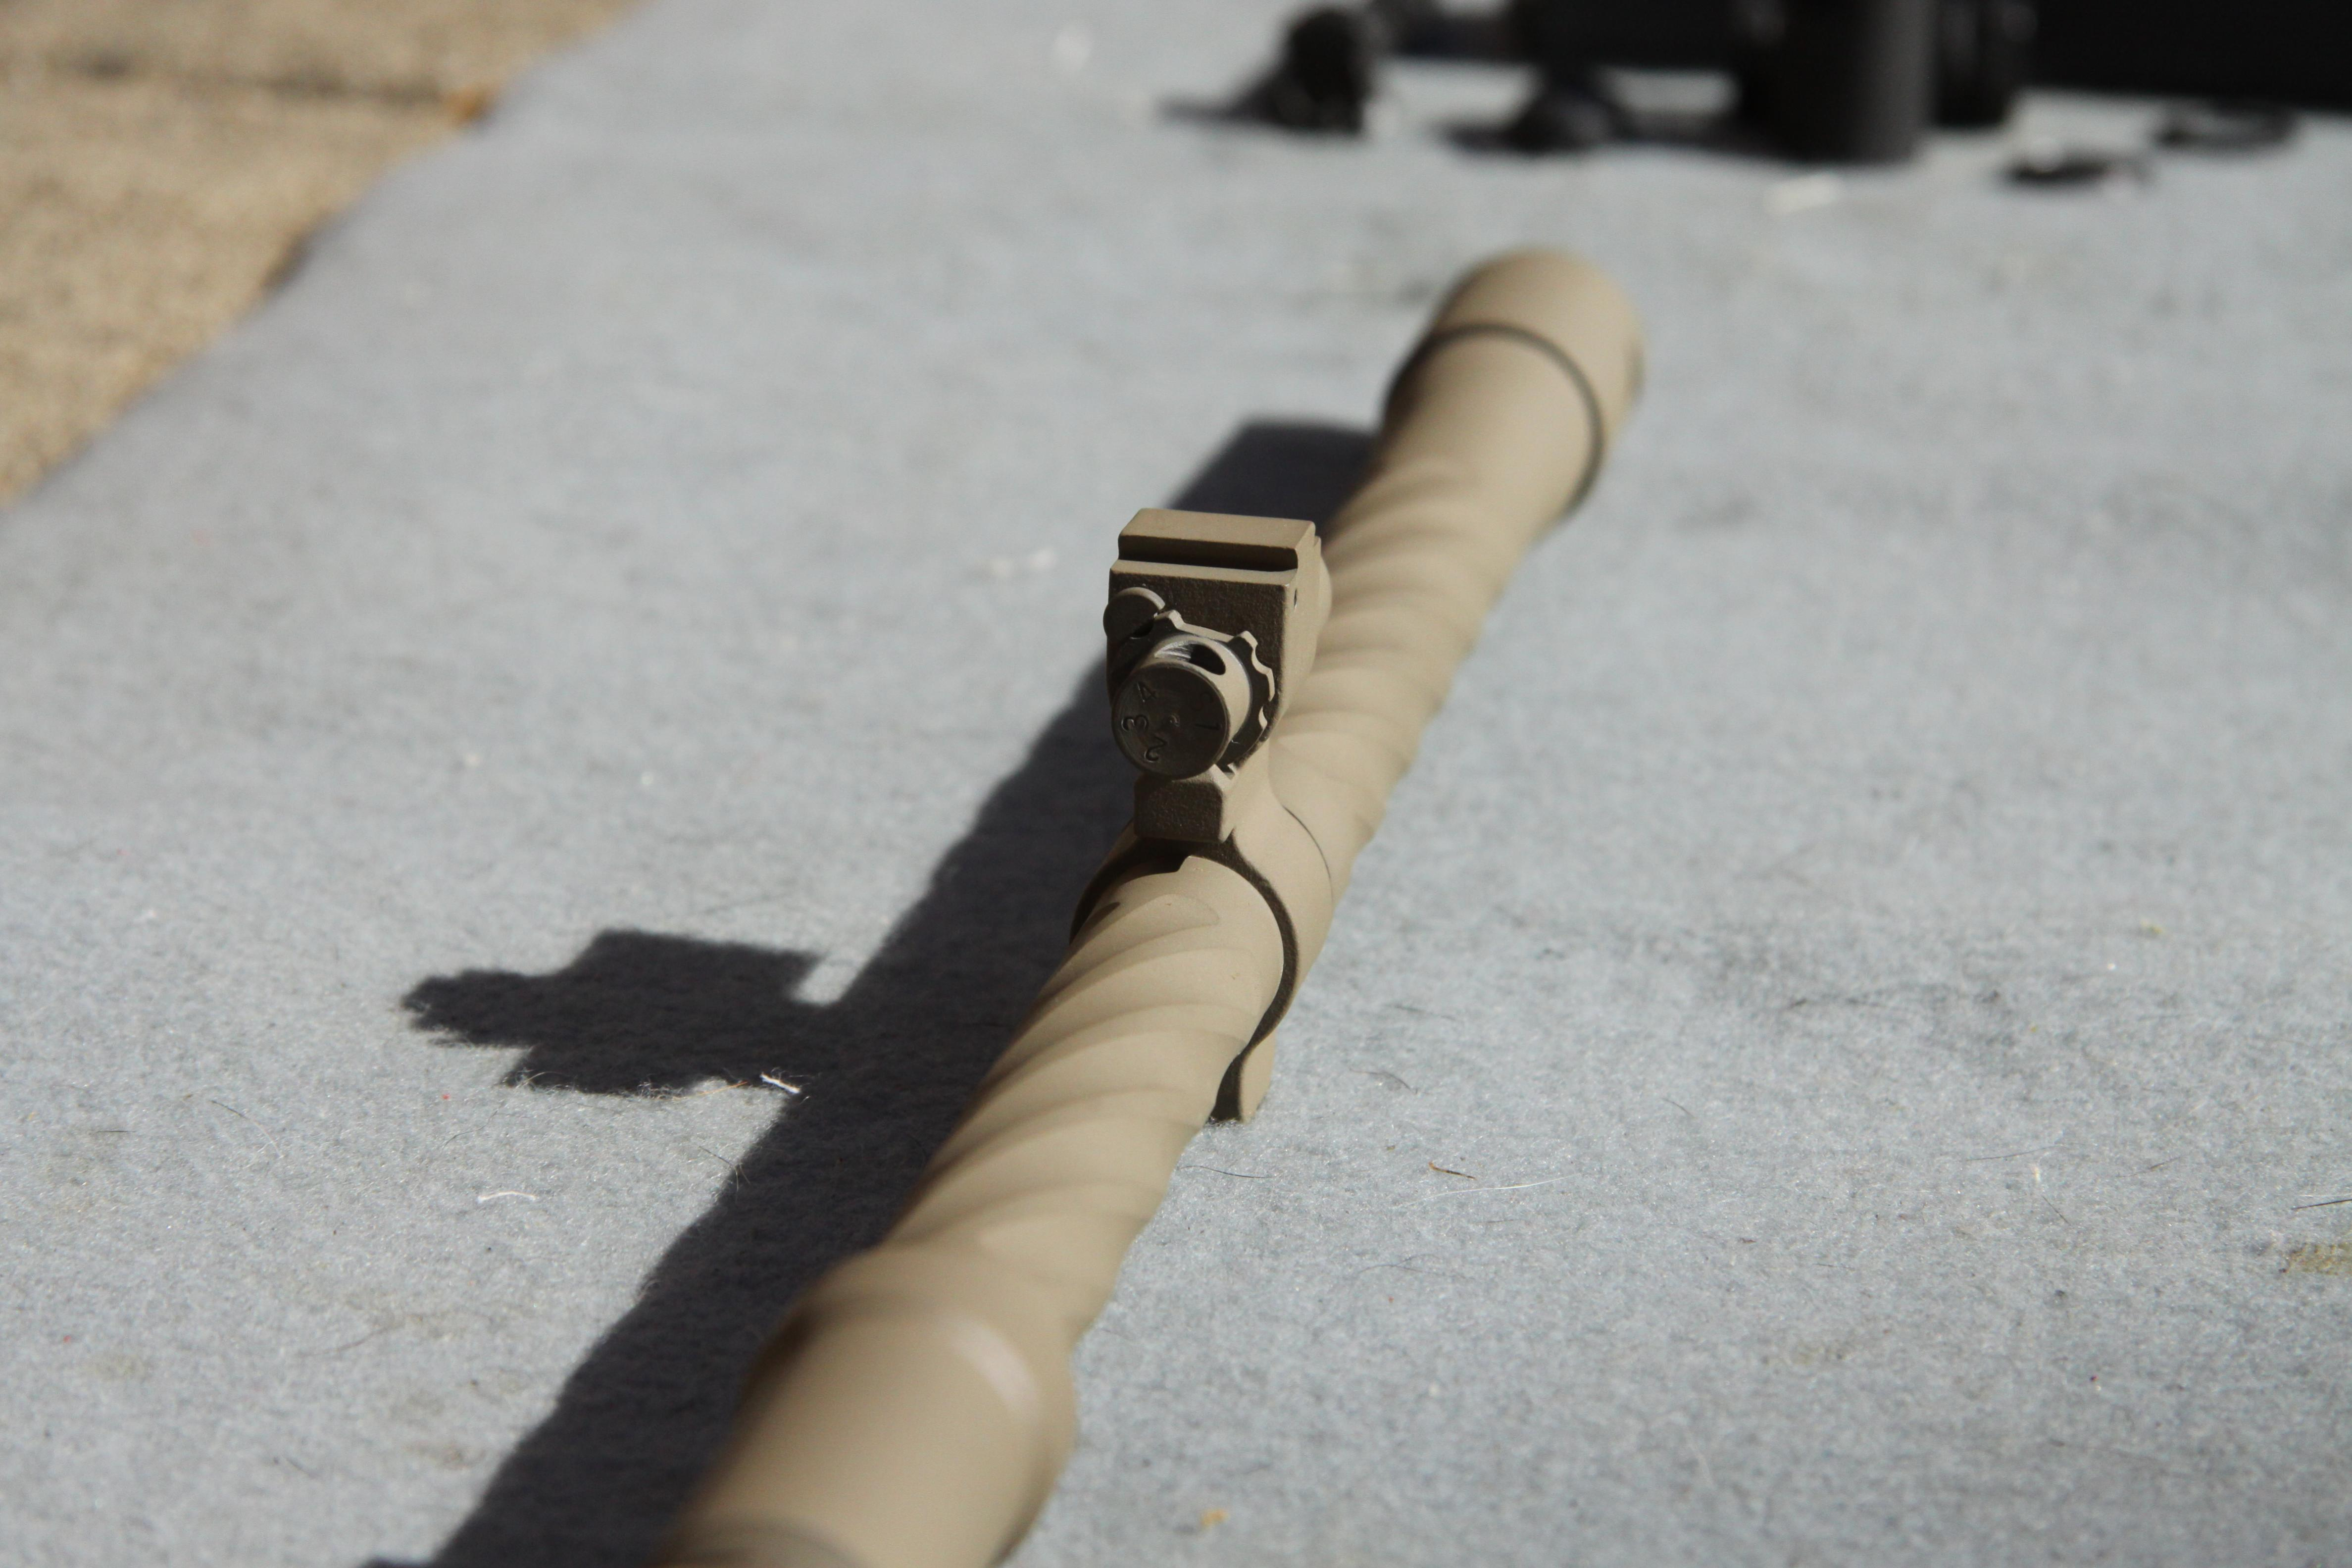 6.8 conversion w/ fluted & Cerakoted barrel-photo-4.jpg